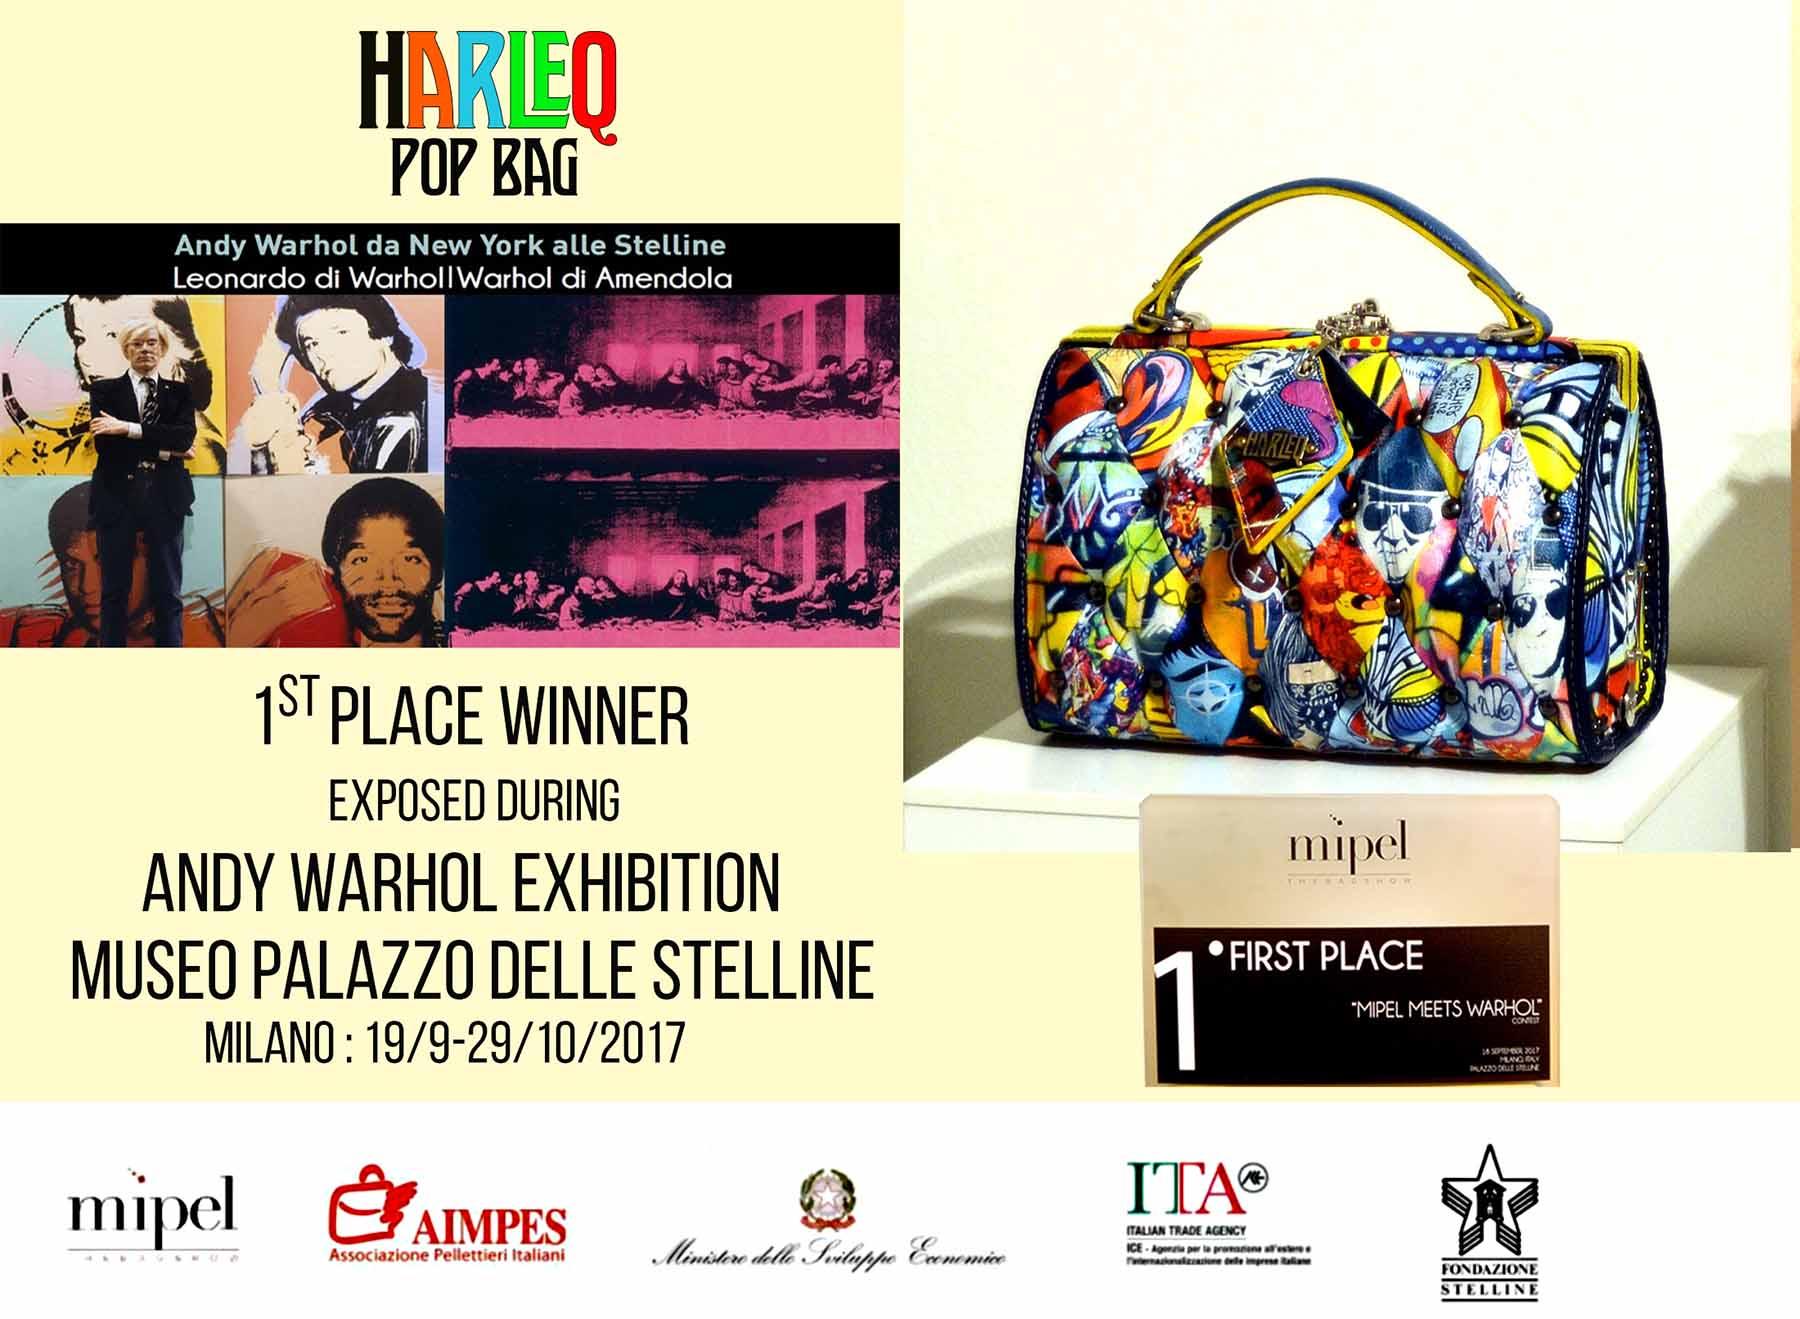 harleq-pop-bag-andy-warhol-exhibition